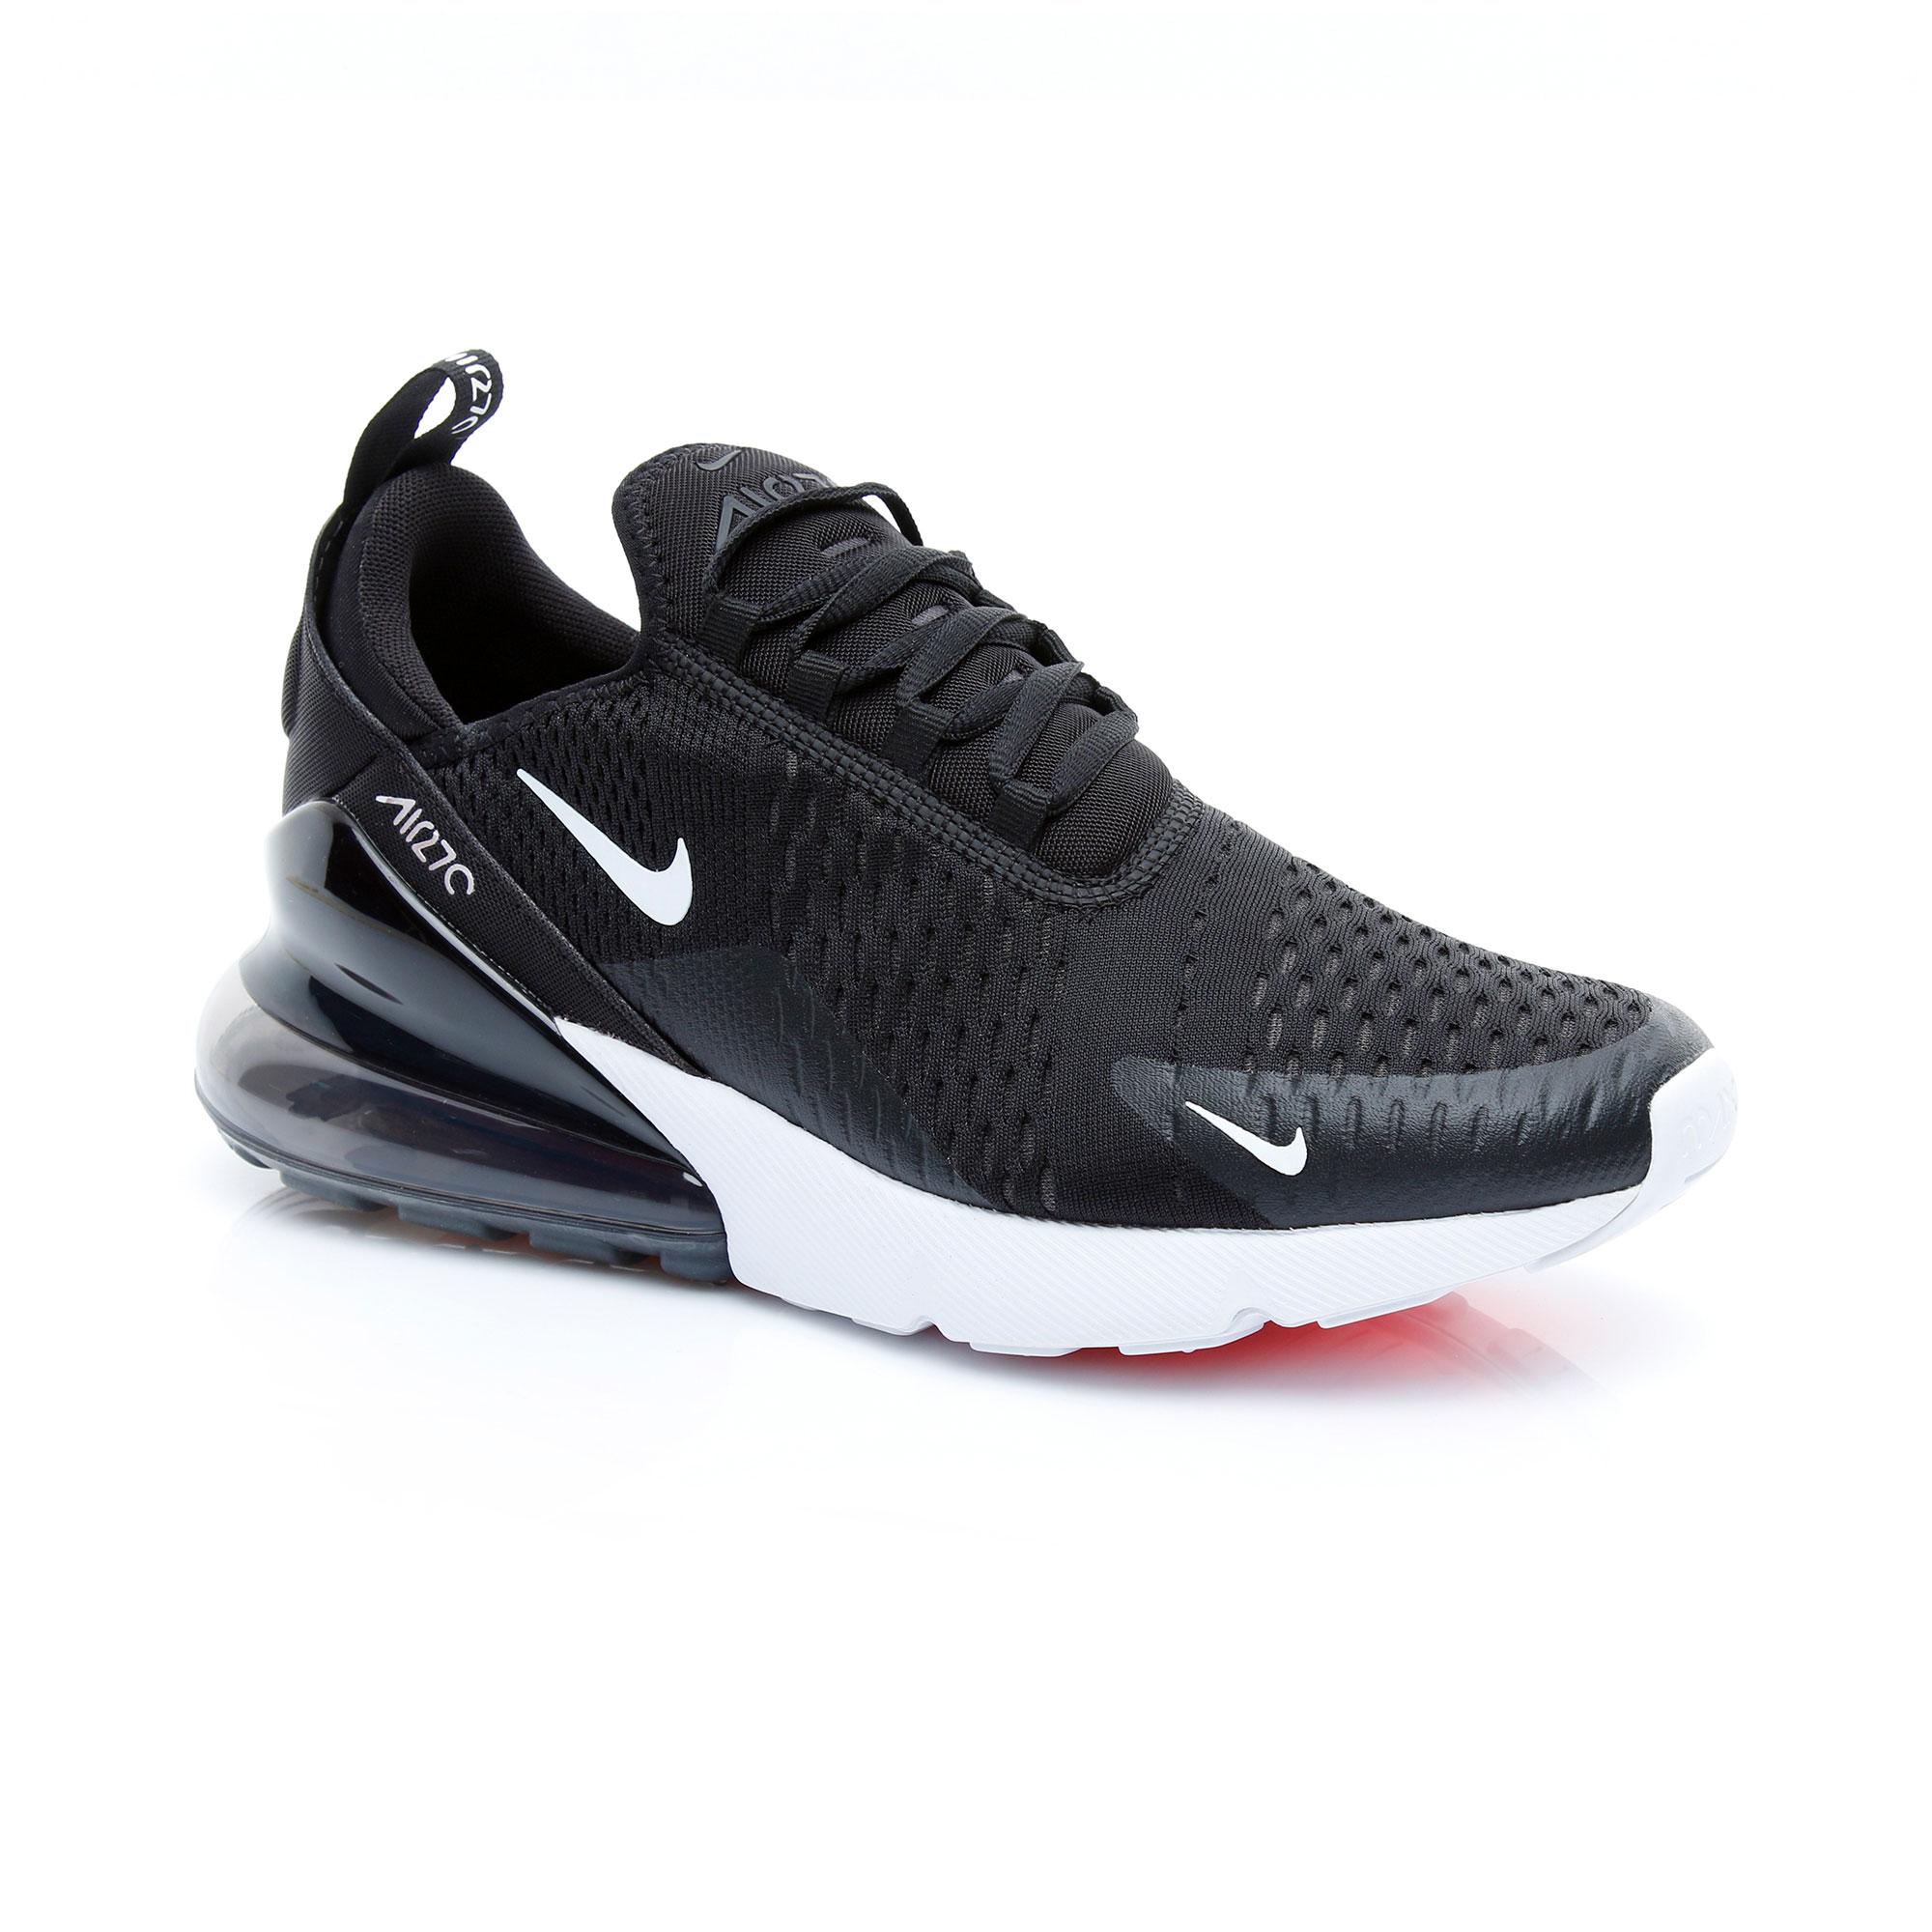 Nike Air Max 270 Erkek Siyah Spor Ayakkabi